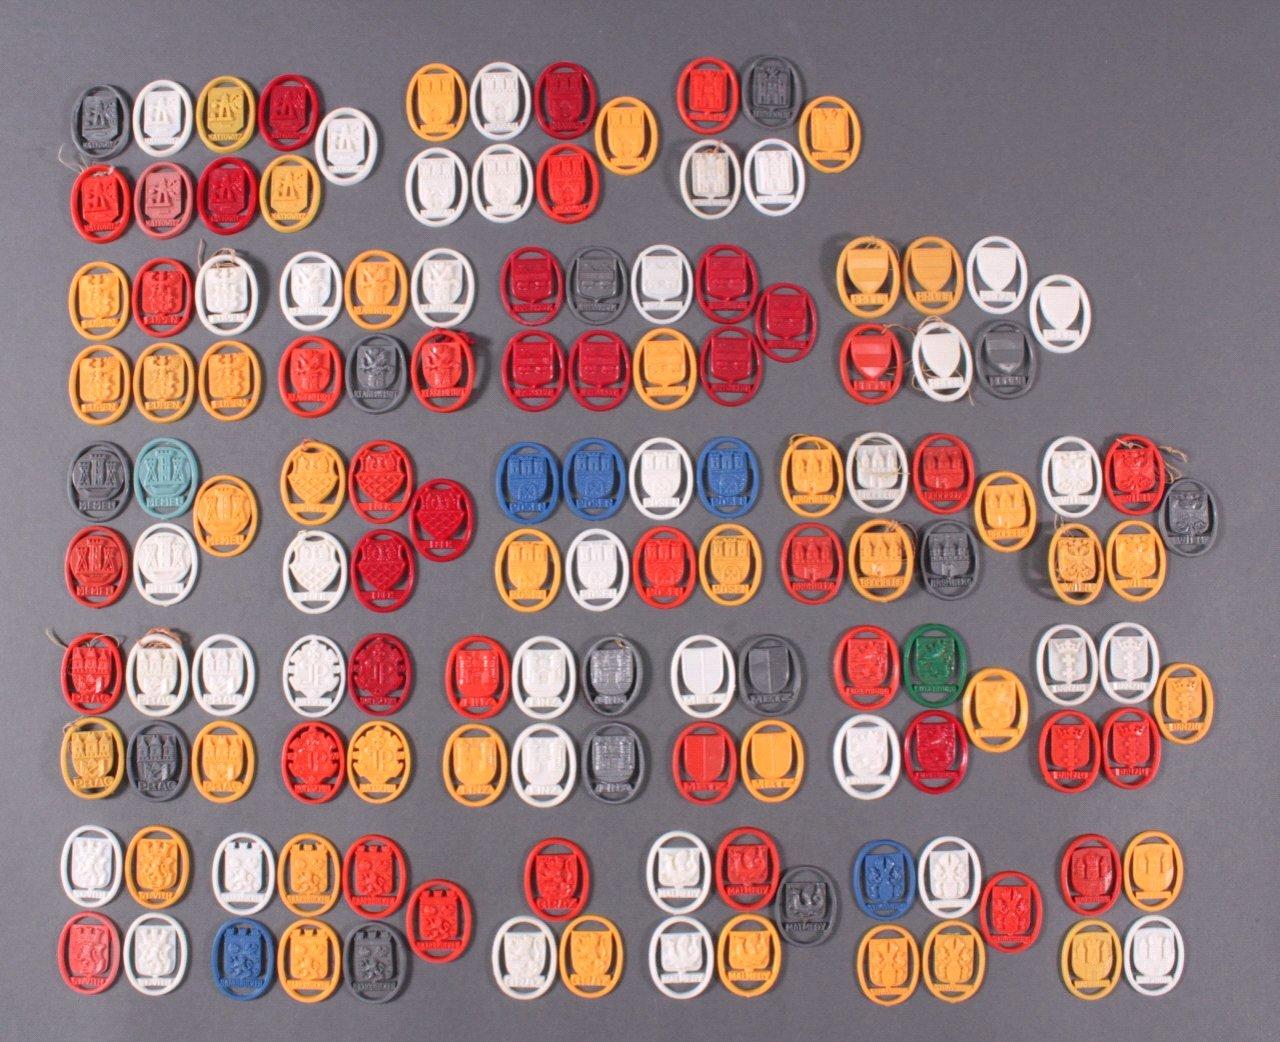 Konvolut WHW Spendenbelege, Städtewappen aus Kunstoff